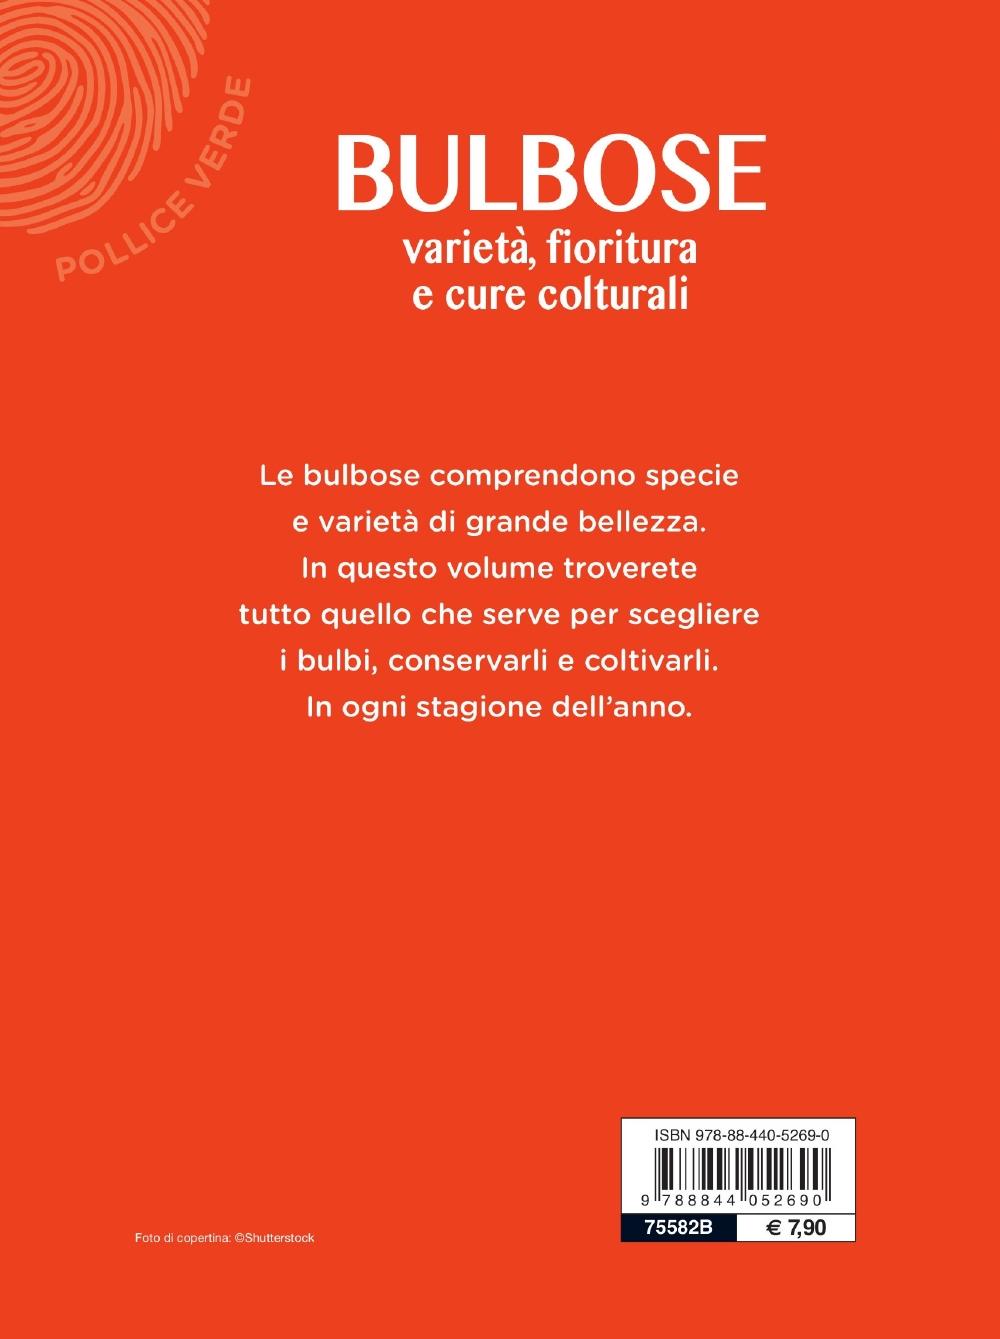 Bulbose